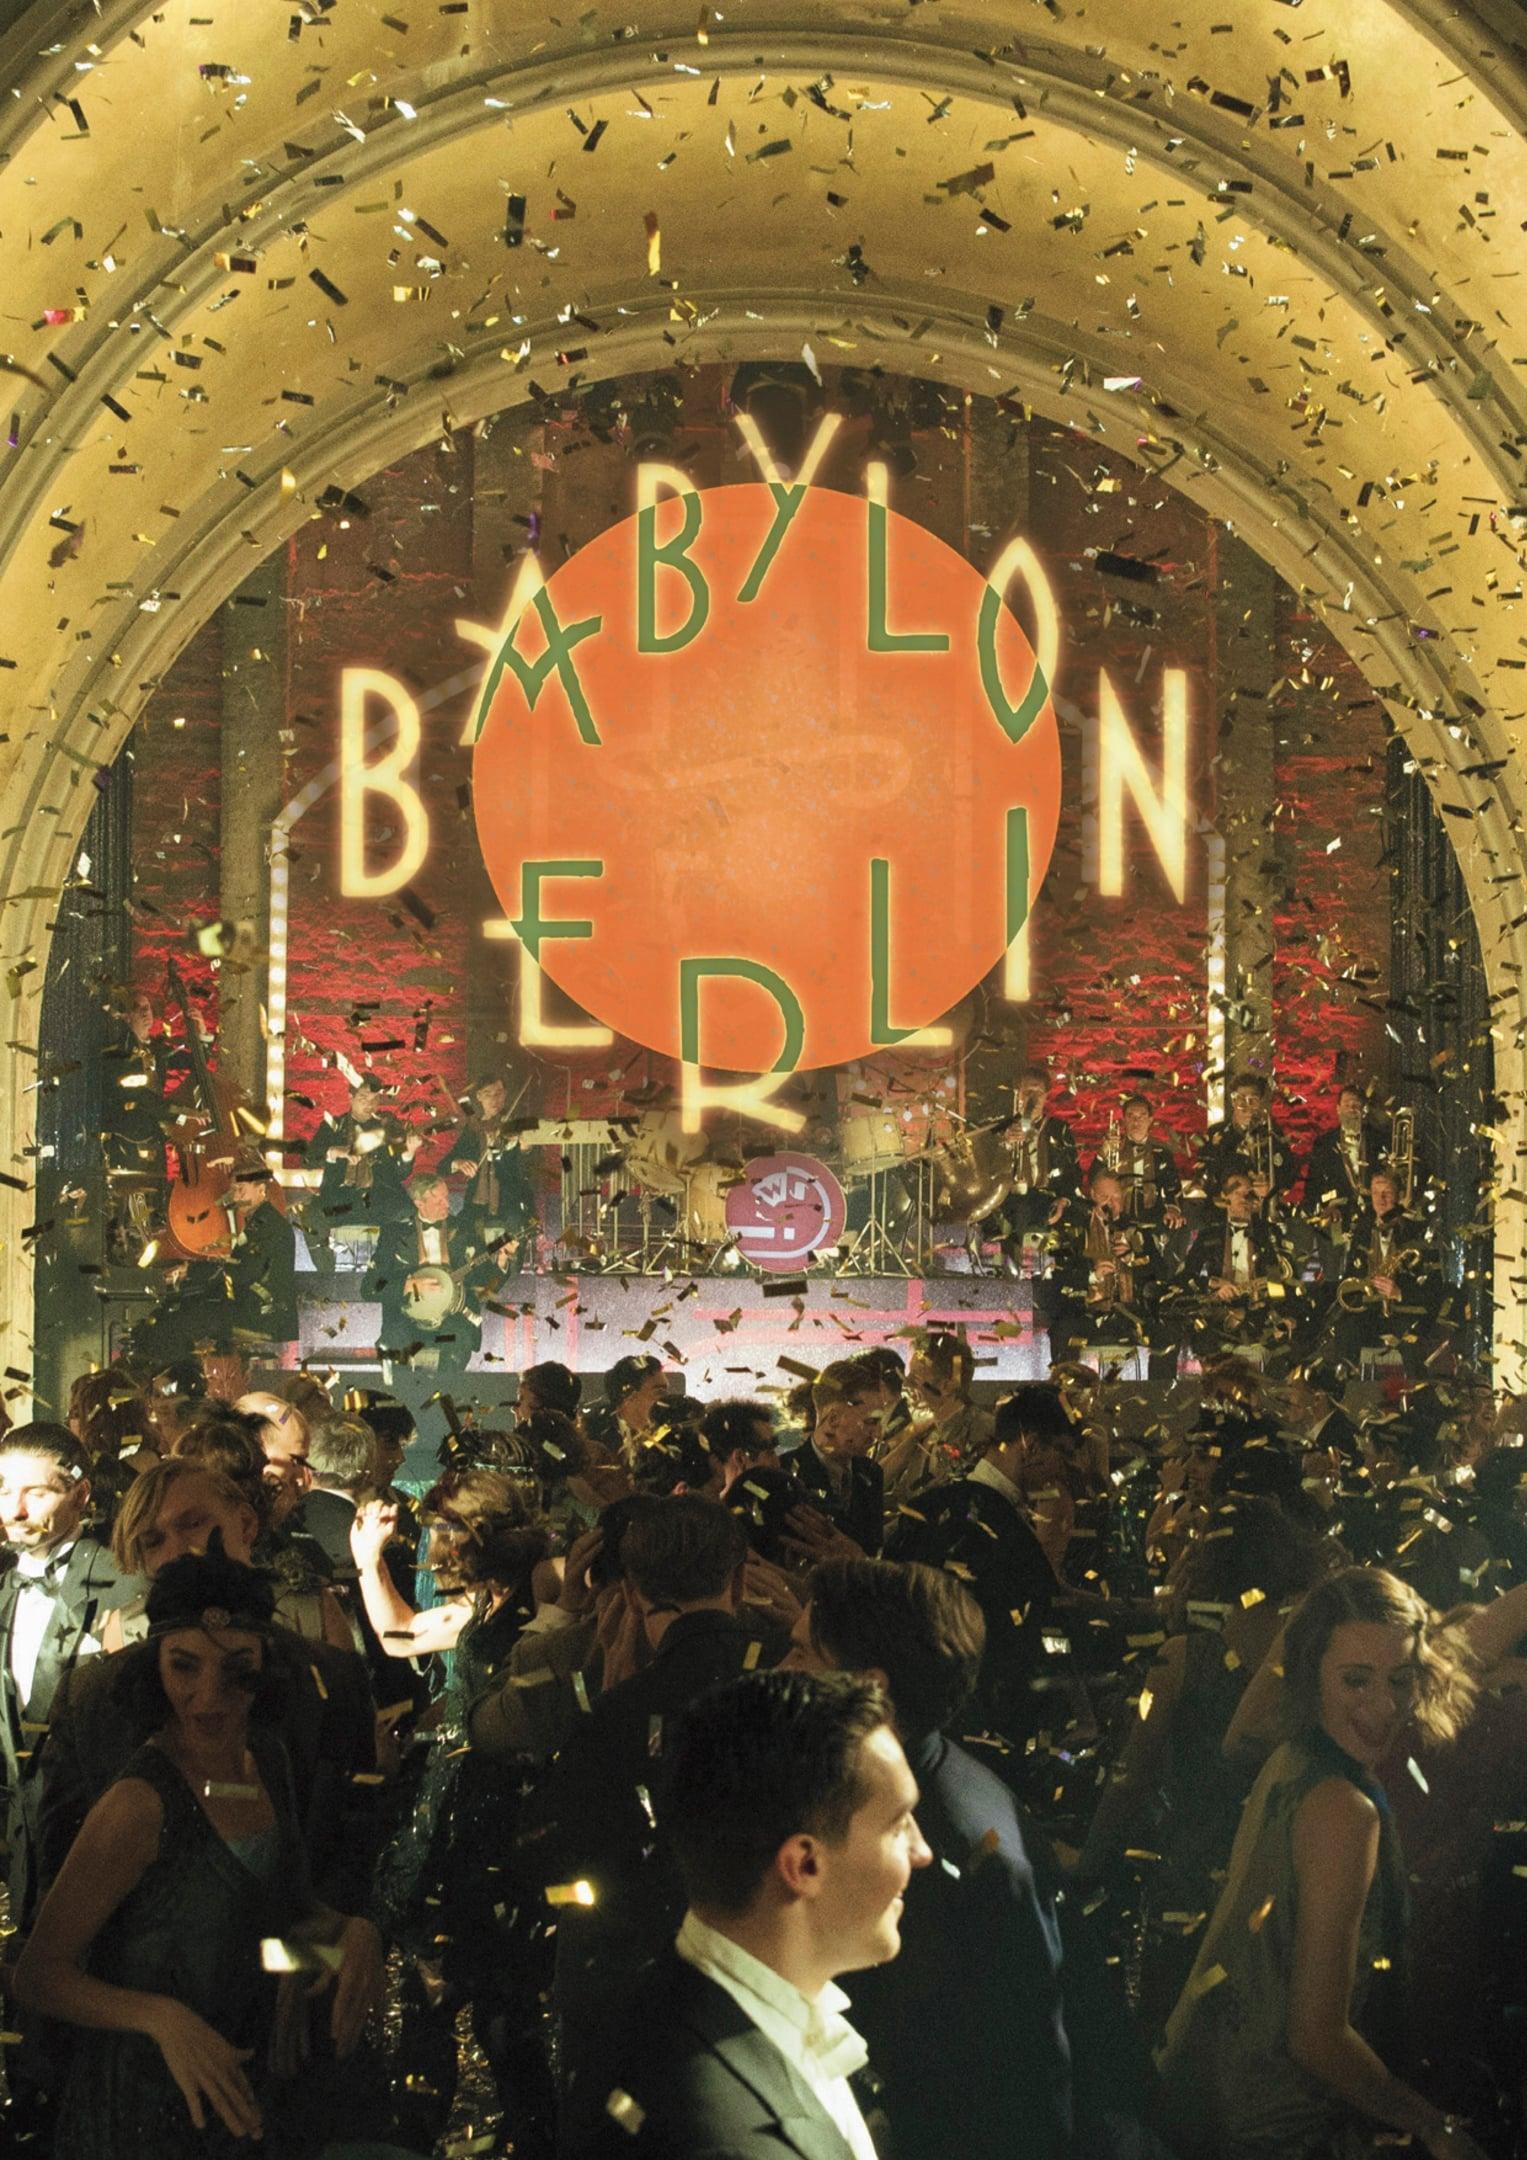 Babylon Berlin (TV Series 2017- ) - Posters — The Movie ...  Babylon Berlin ...